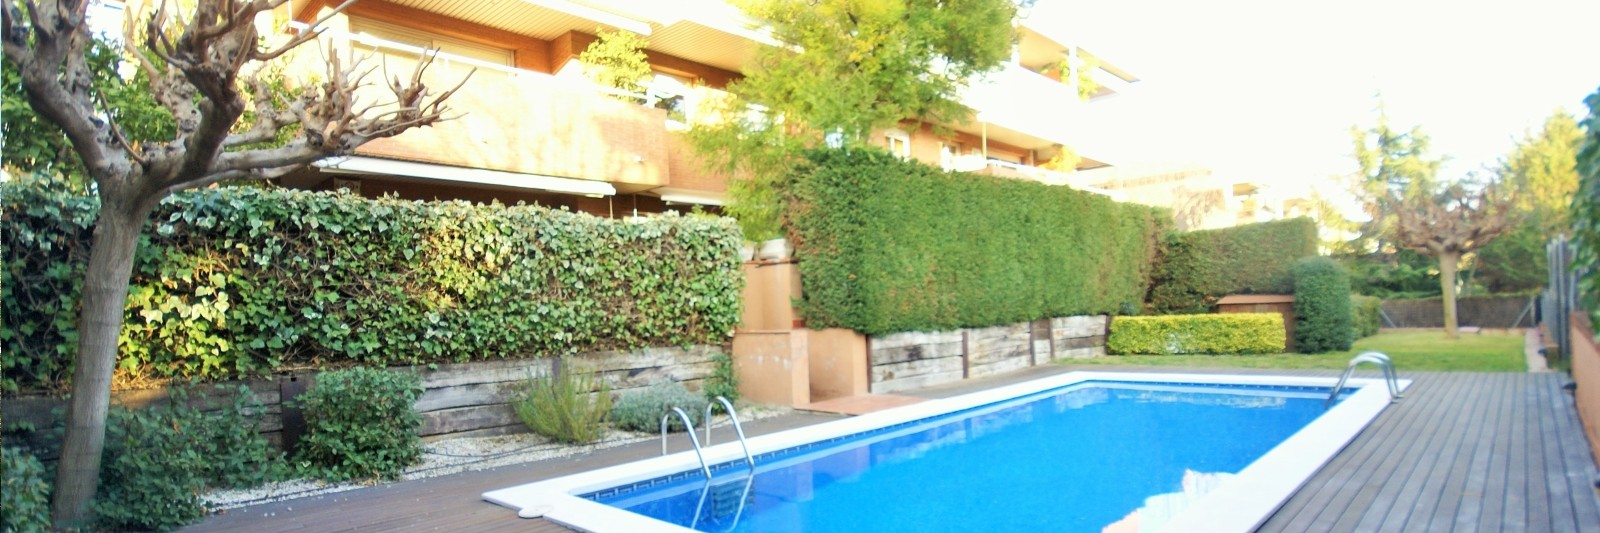 MG Inmobiliaria Sant Cugat - tapia